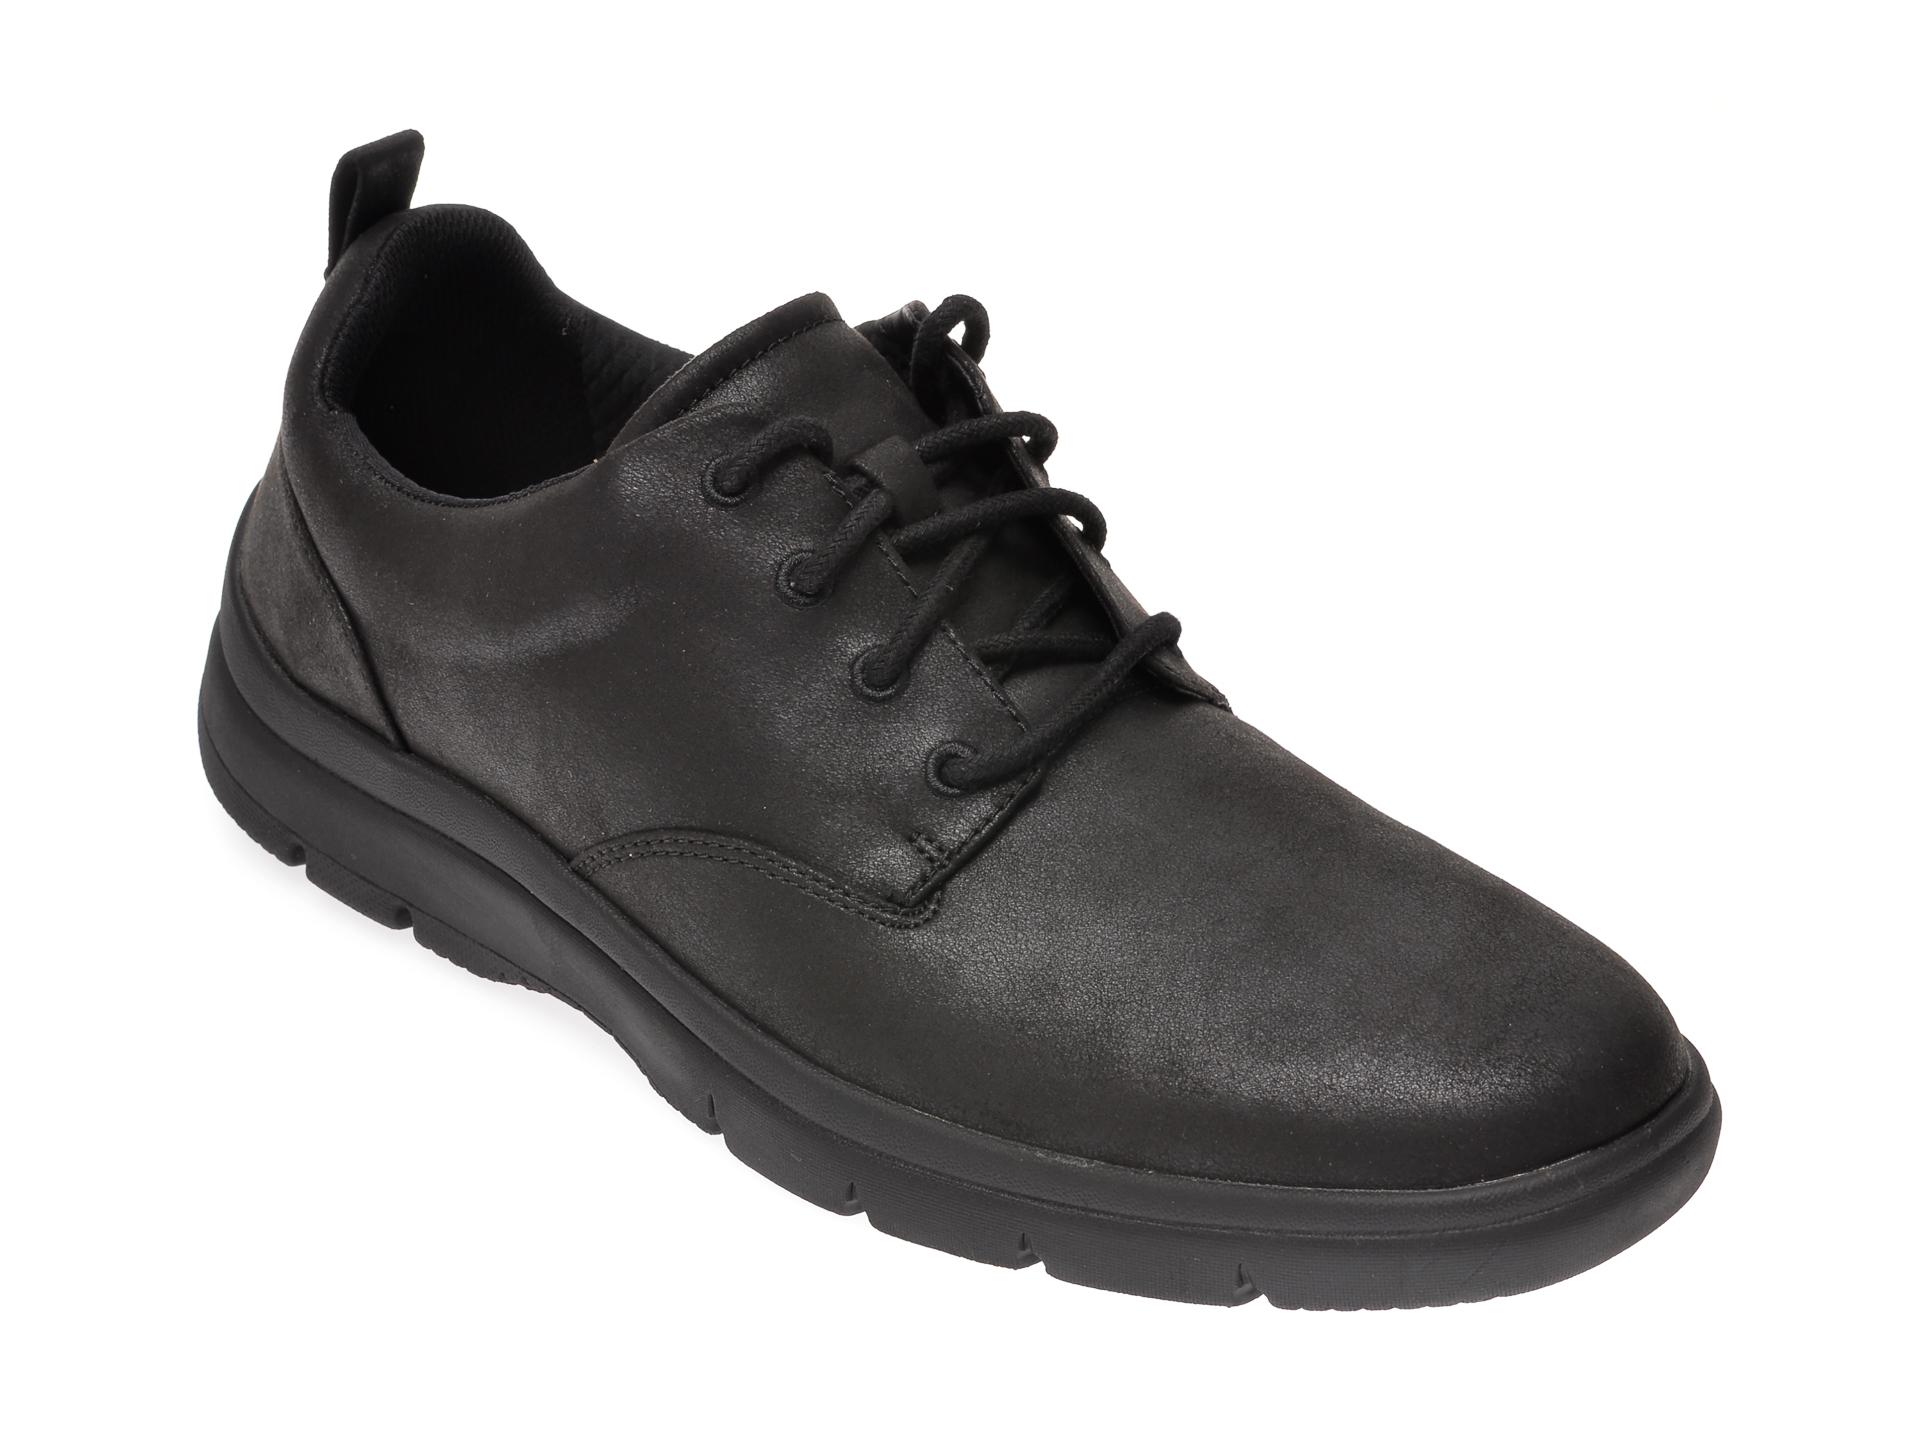 Pantofi CLARKS negri, Tunsil Lane, din piele ecologica